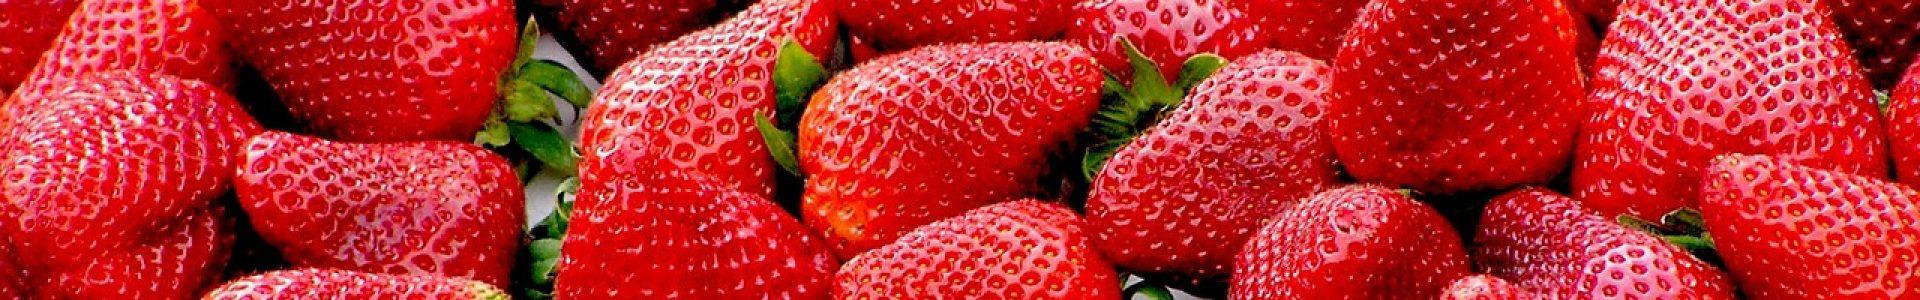 strawberries, red, fruit